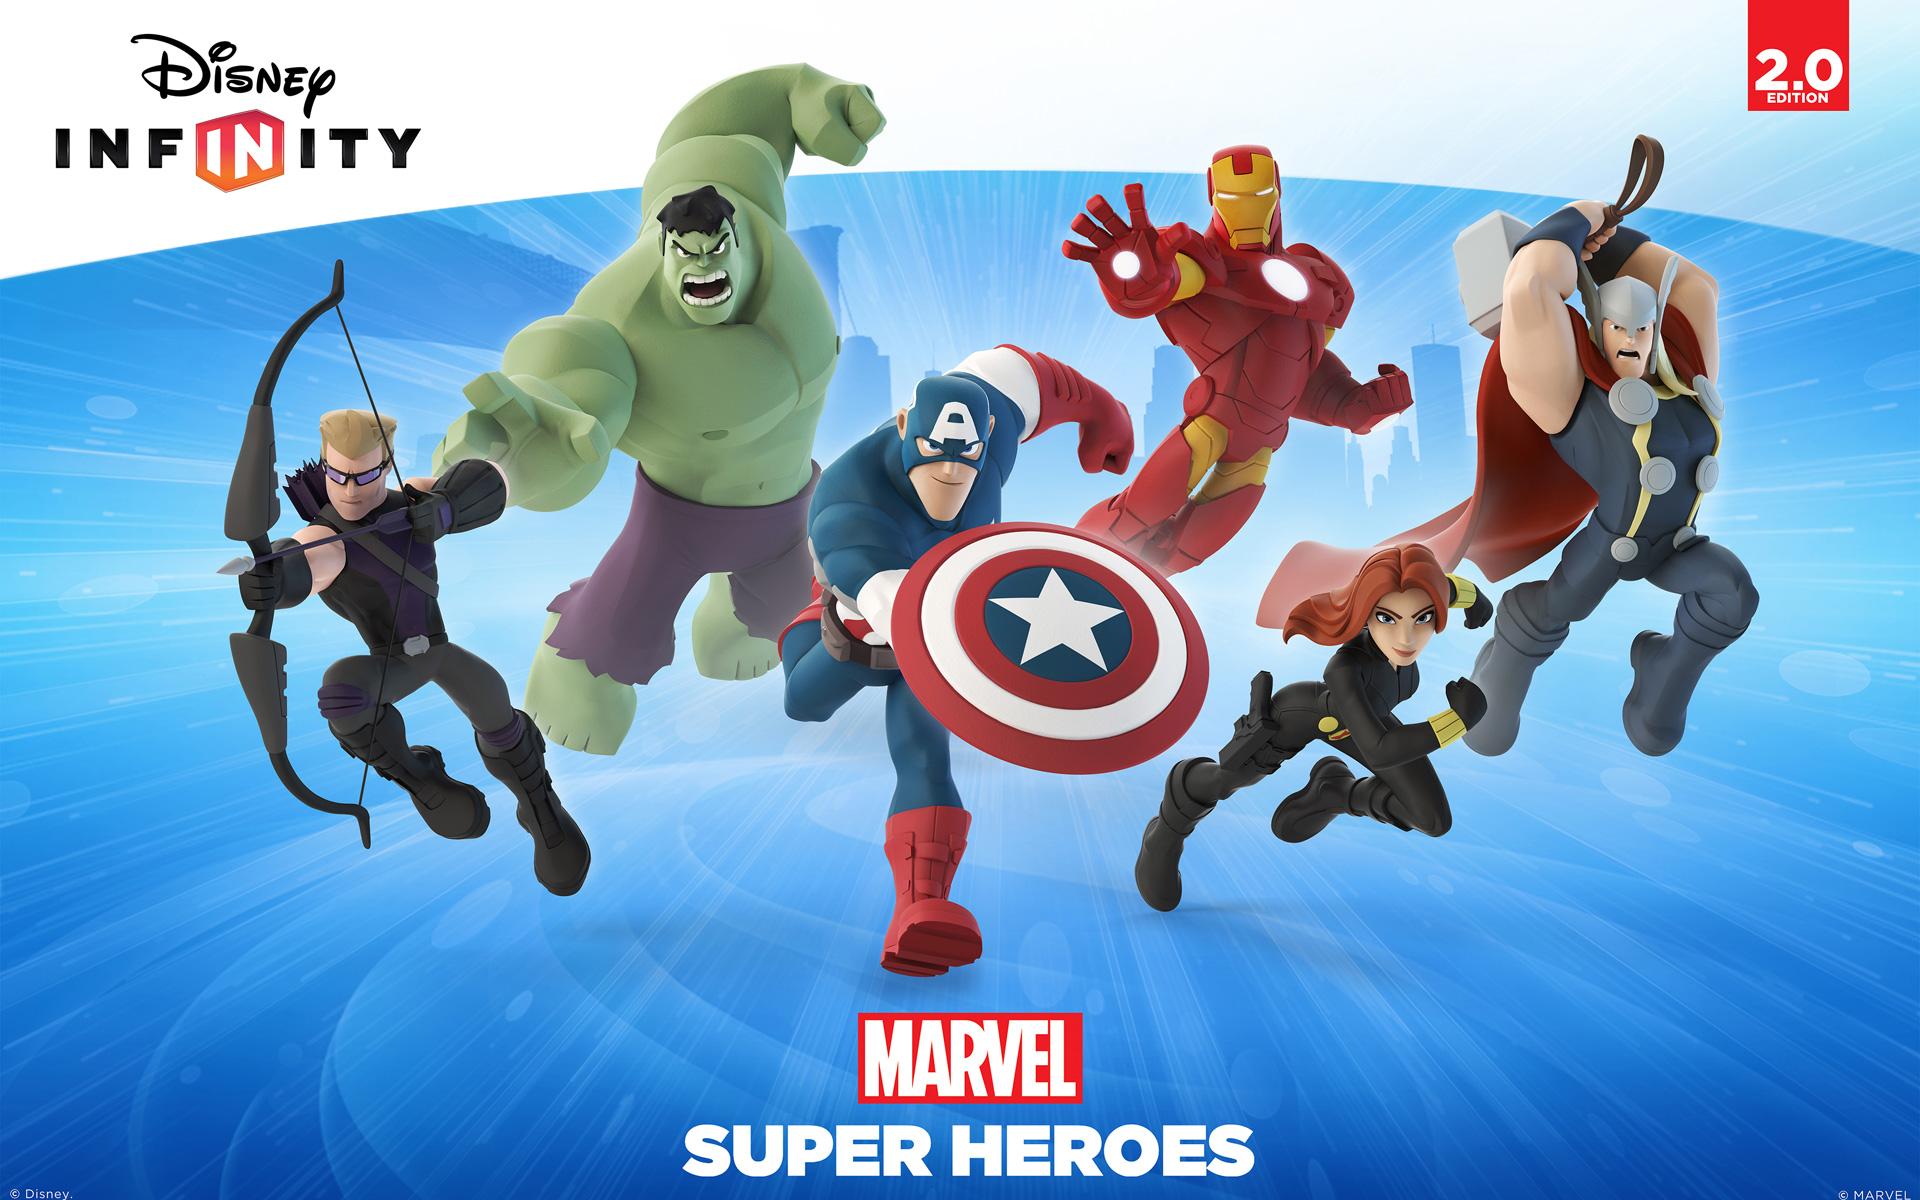 Marvel Super Heroes Wallpaper   HD Wallpapers Desktop Wallpaper 1920x1200